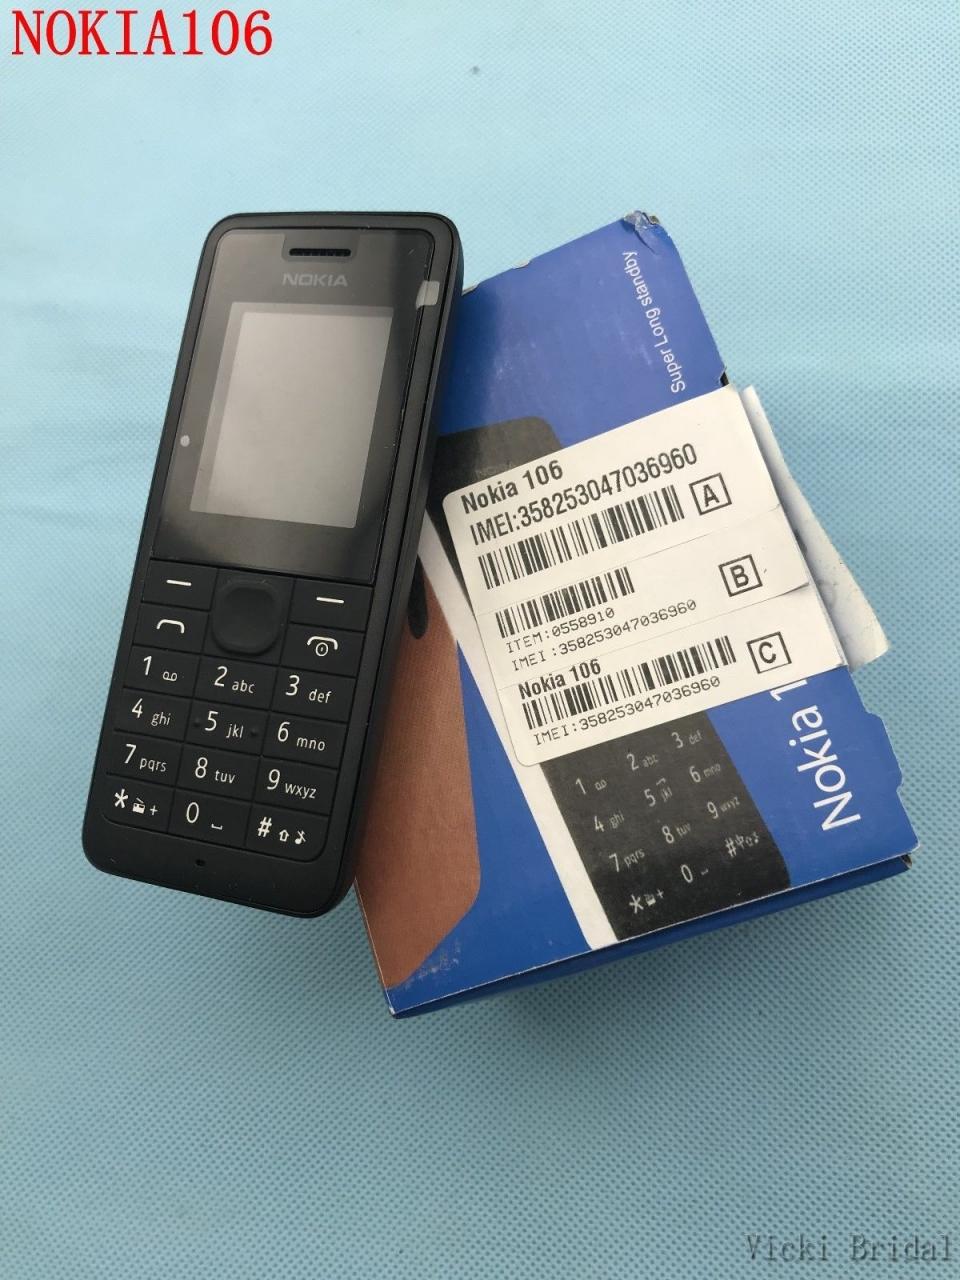 new Nokia 106 Unlocked Simple Mobile Phone Multiple keyboards languages white 12